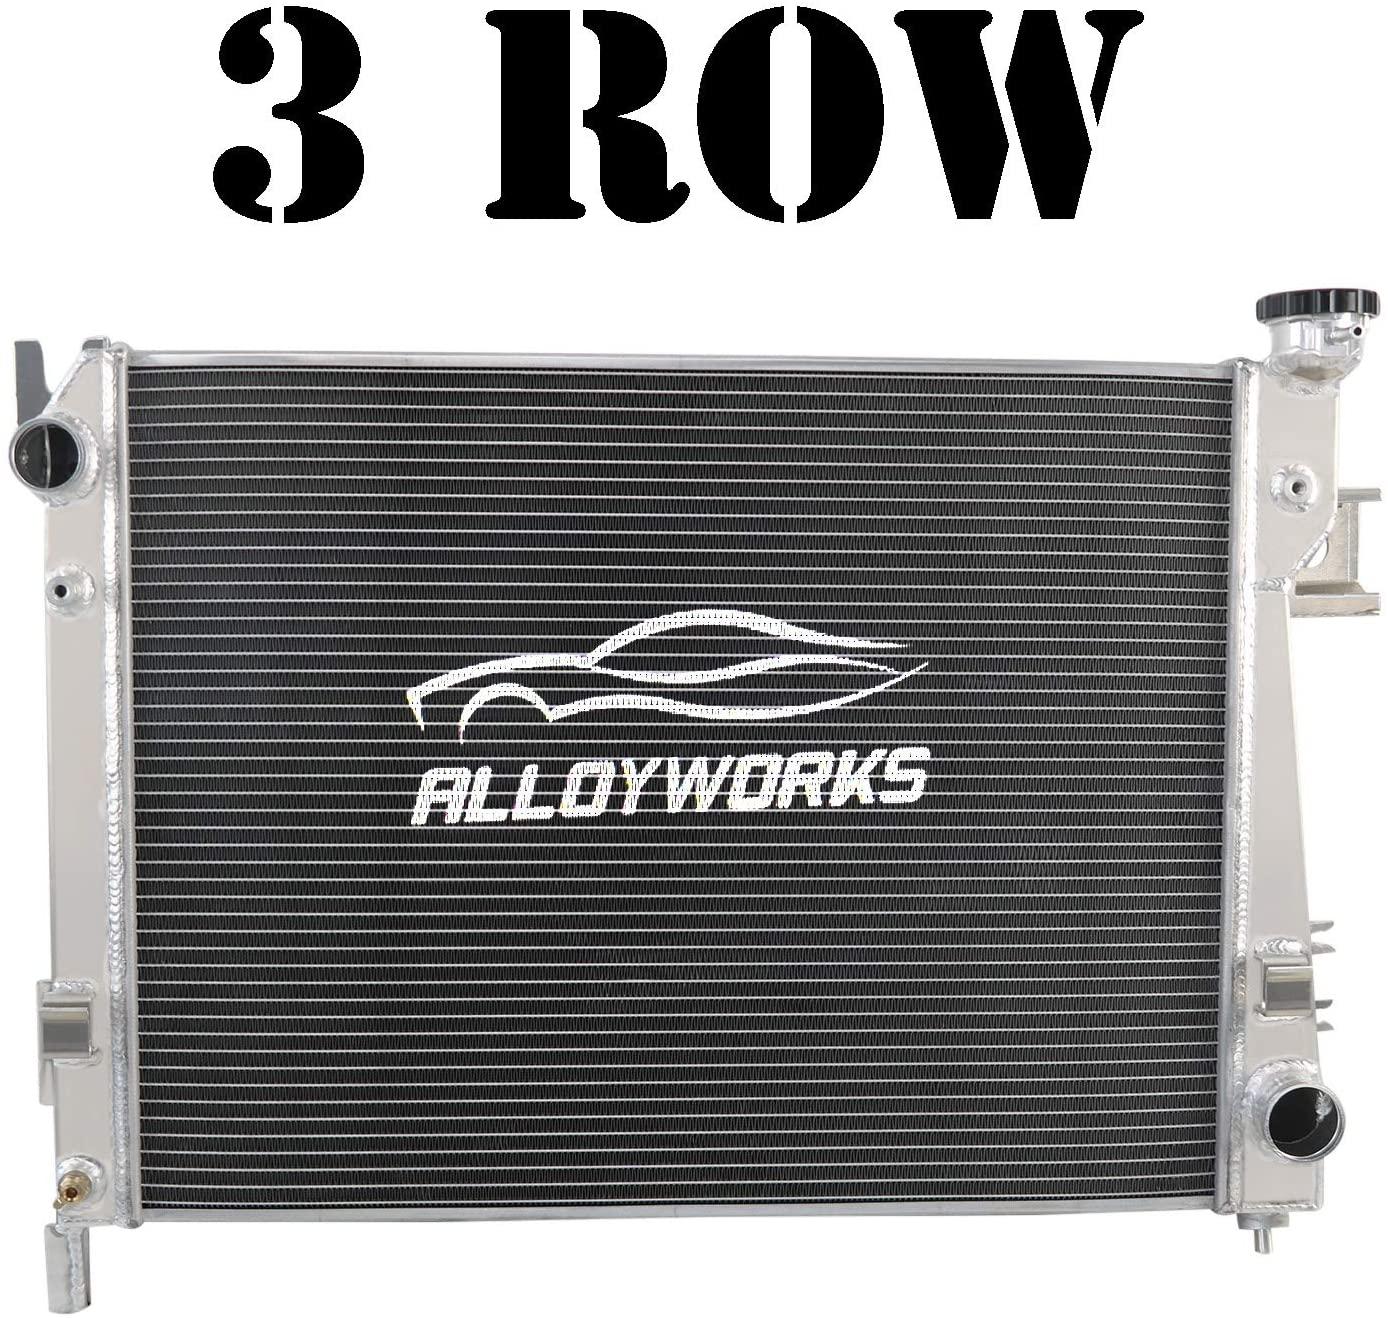 ALLOYWORKS 3 Row All Aluminum Radiator For 2003-2009 Dodge Ram 1500 2500 3500 L6 V6 V8 V10 3.4L 3.7L 3.8L 3.9L 4.7L 5.7L 5.9L 8.0L 8.3L